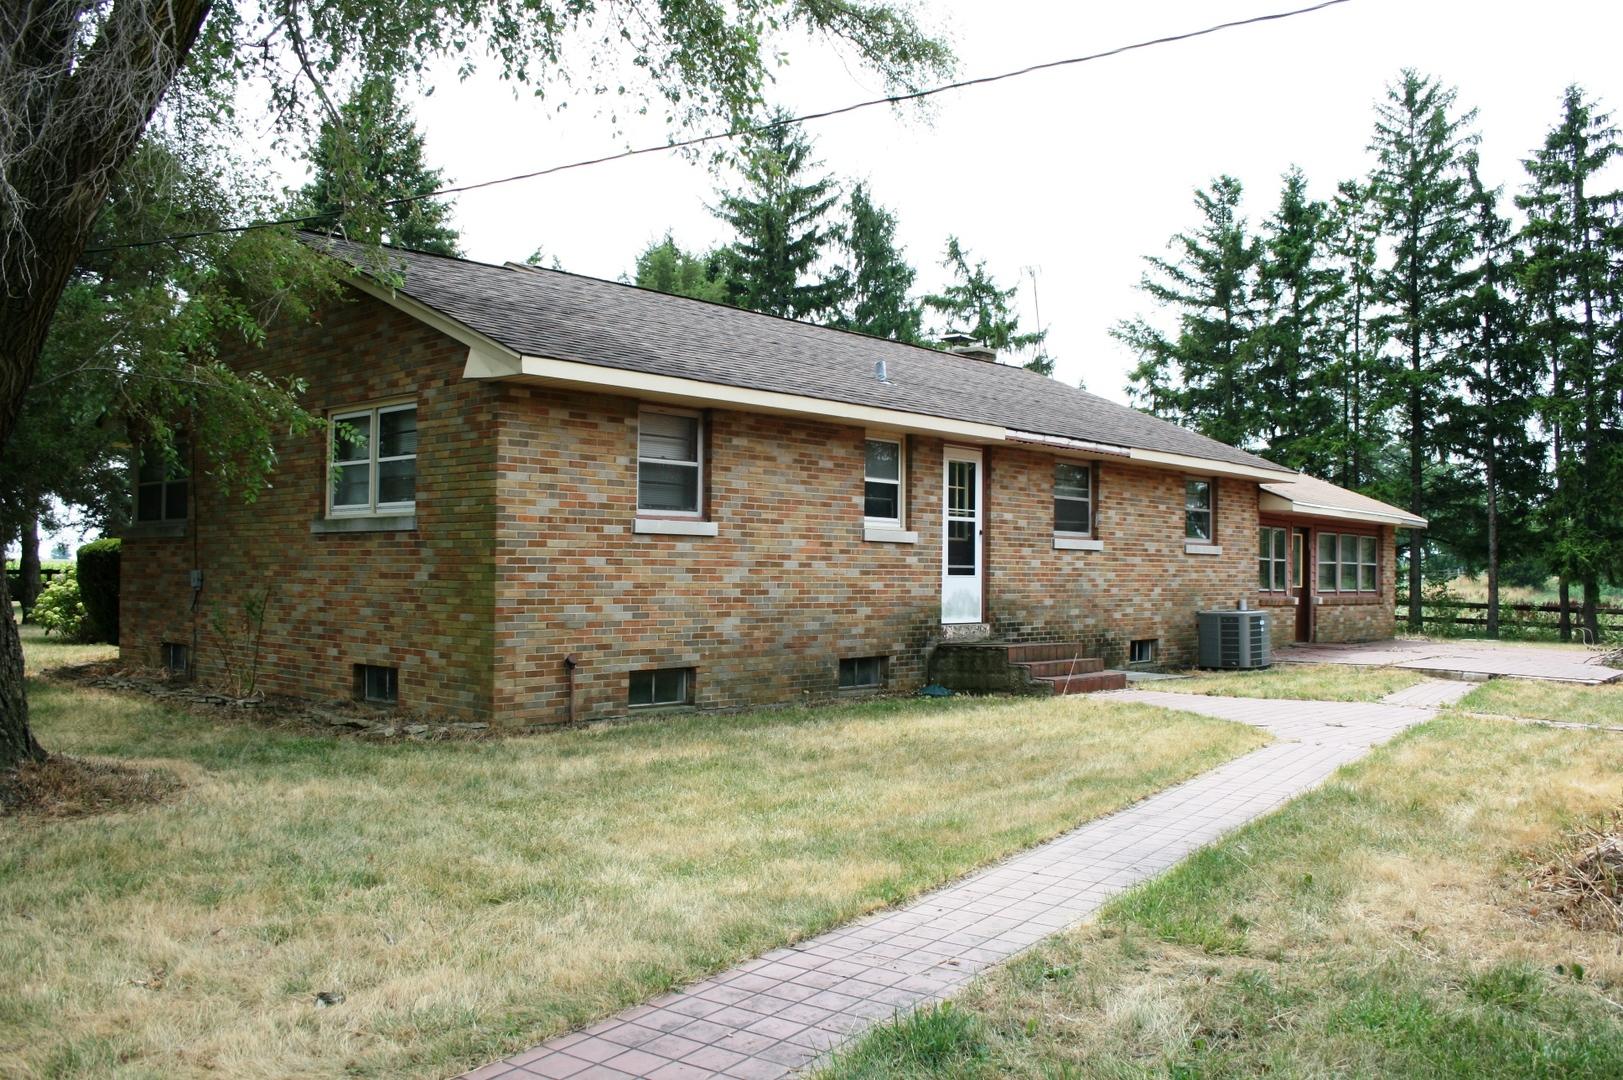 25640 West 119th, PLAINFIELD, Illinois, 60585